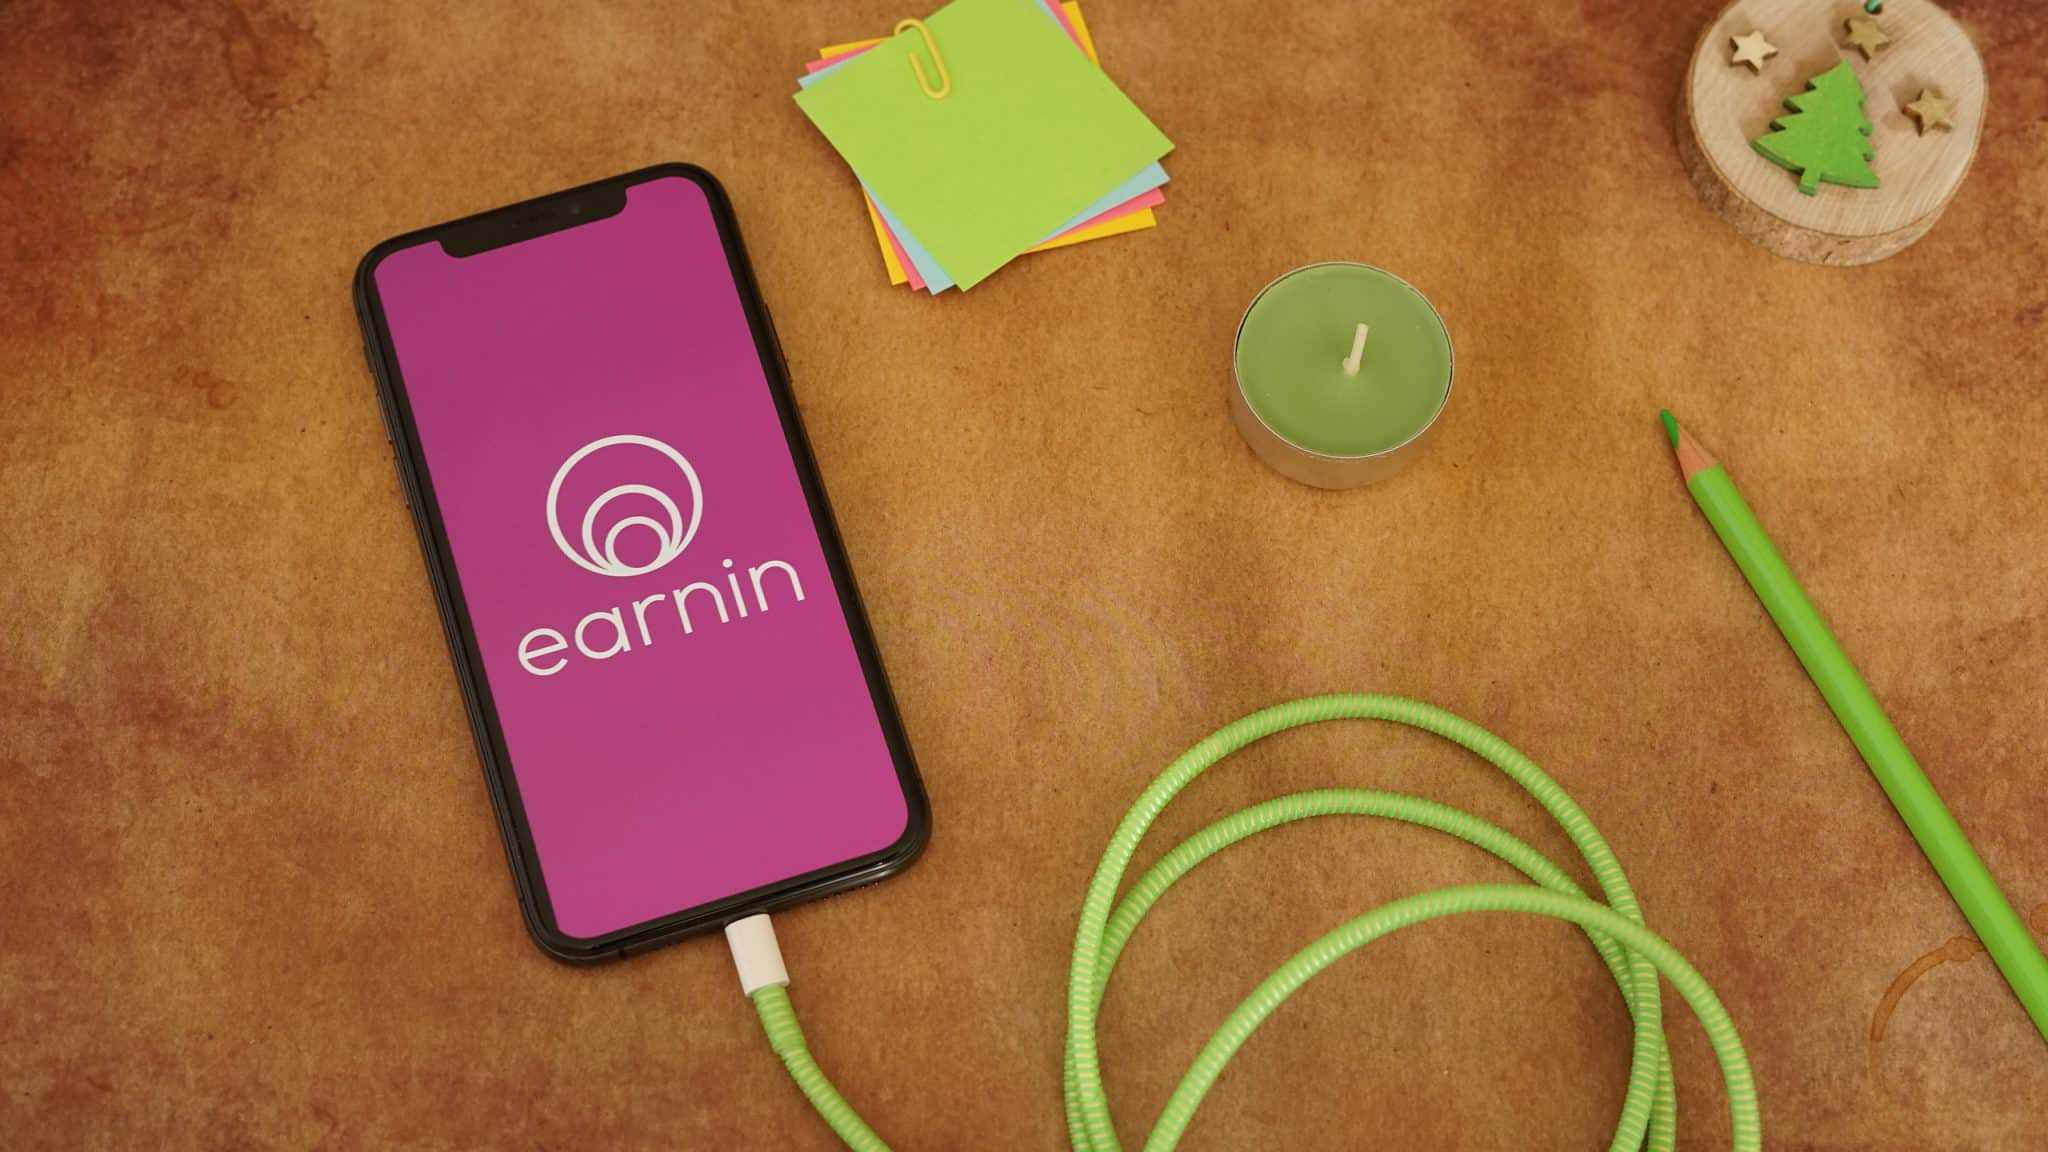 Image of earnin app on smartphone